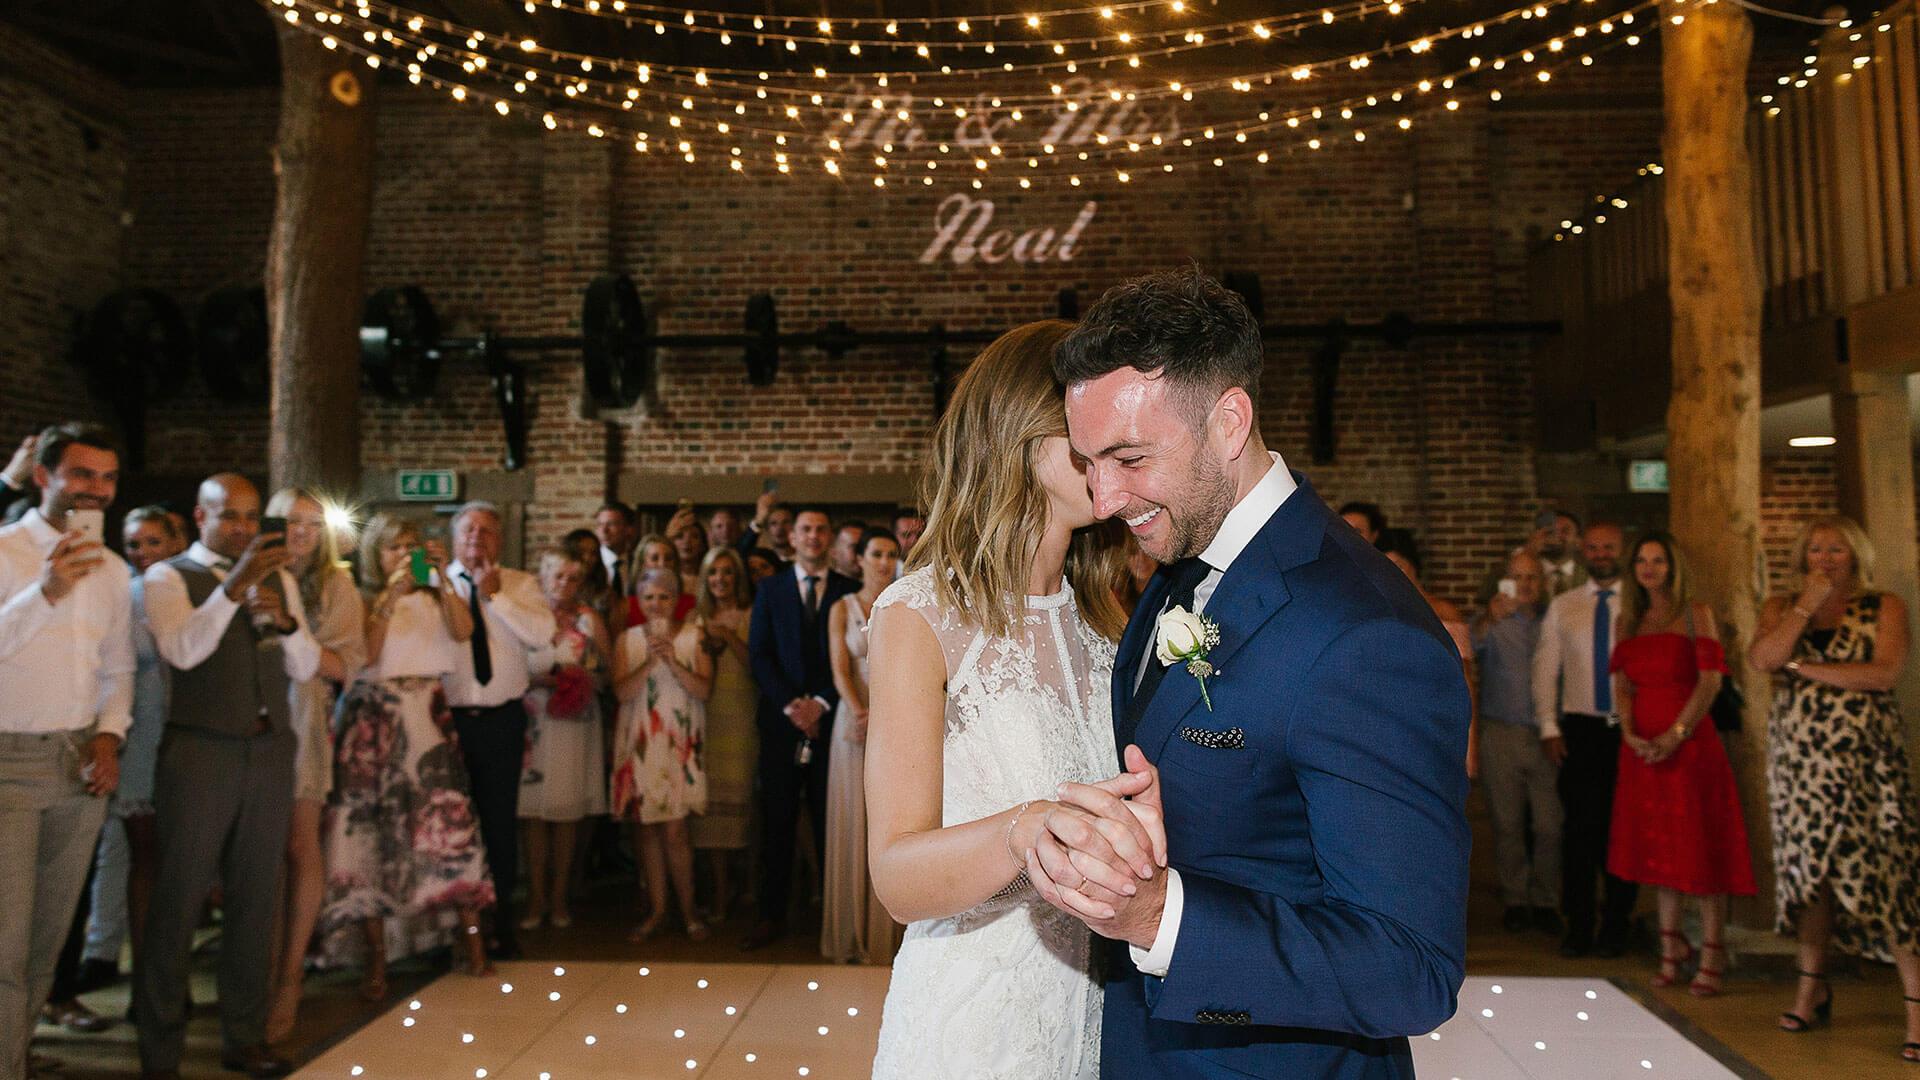 happy-couple-first-wedding-dance.jpg